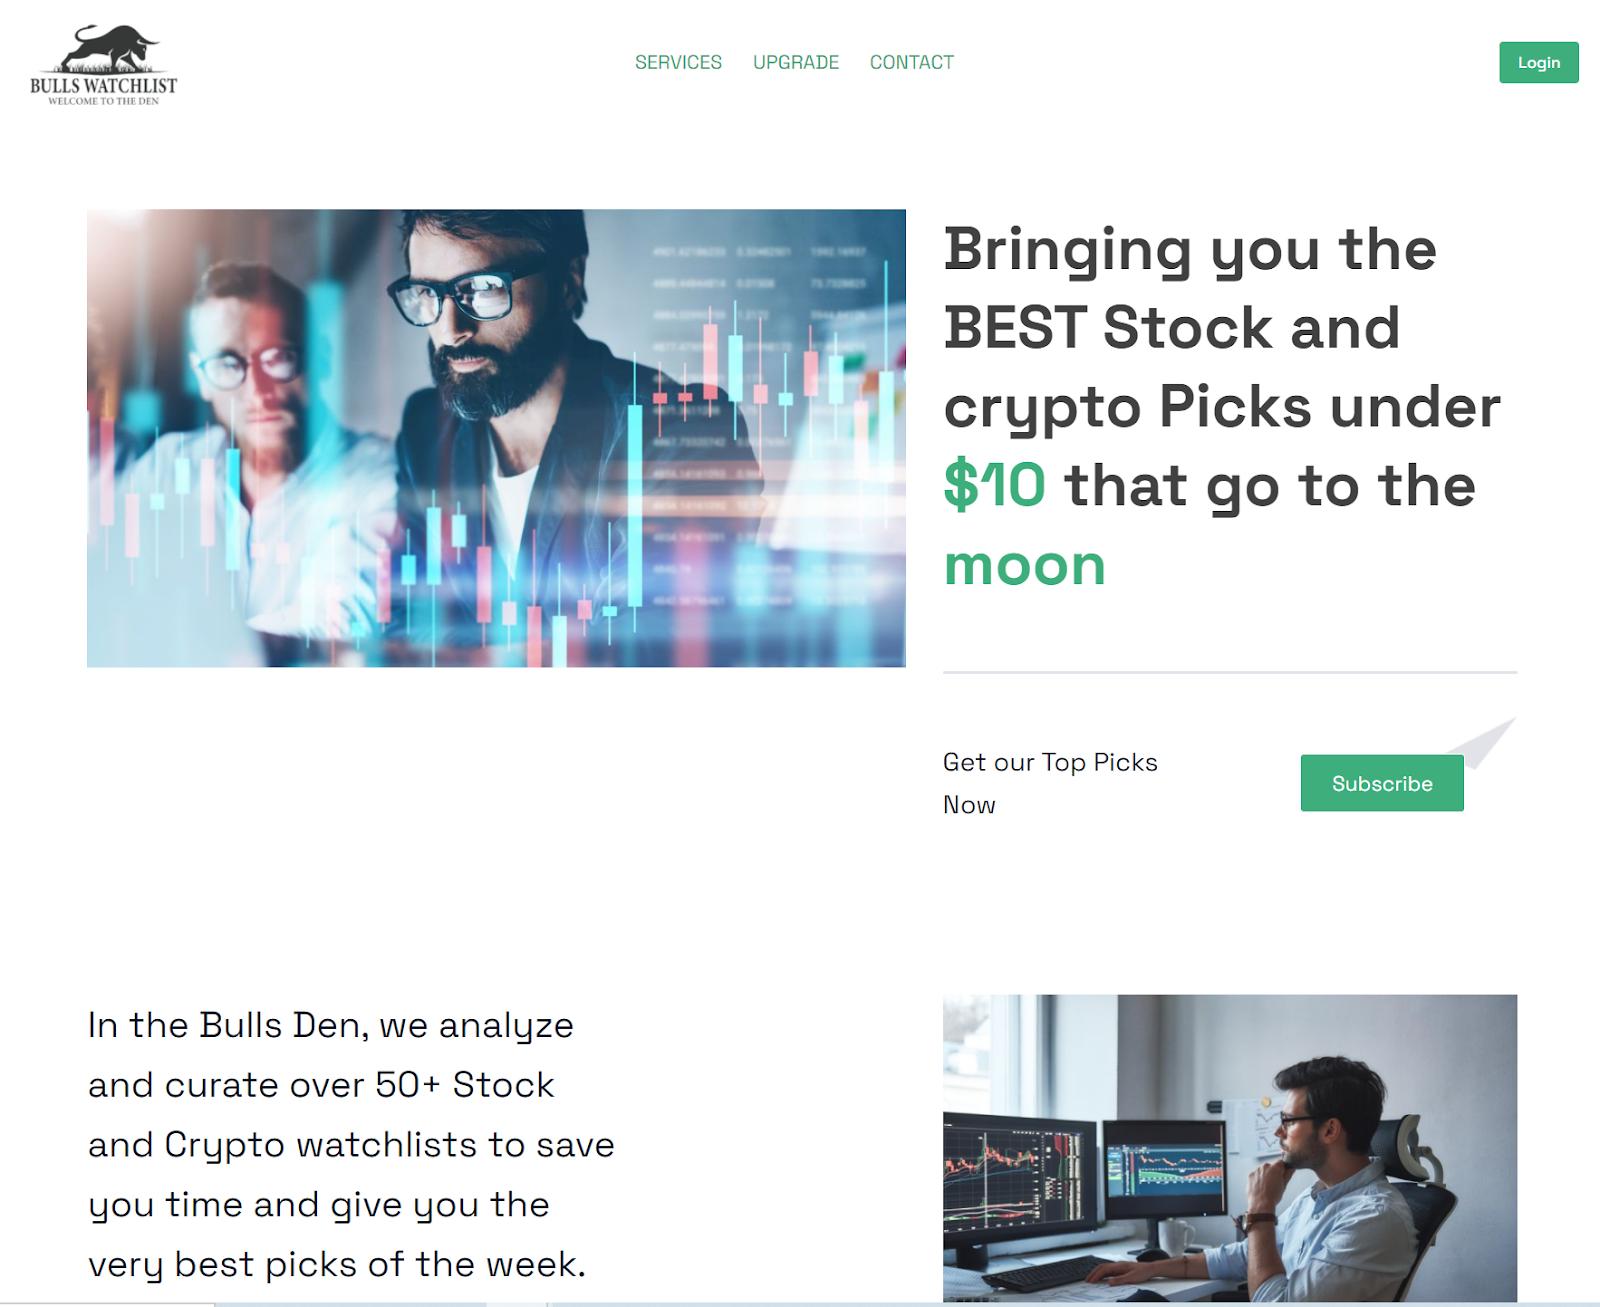 bullswatchlist content